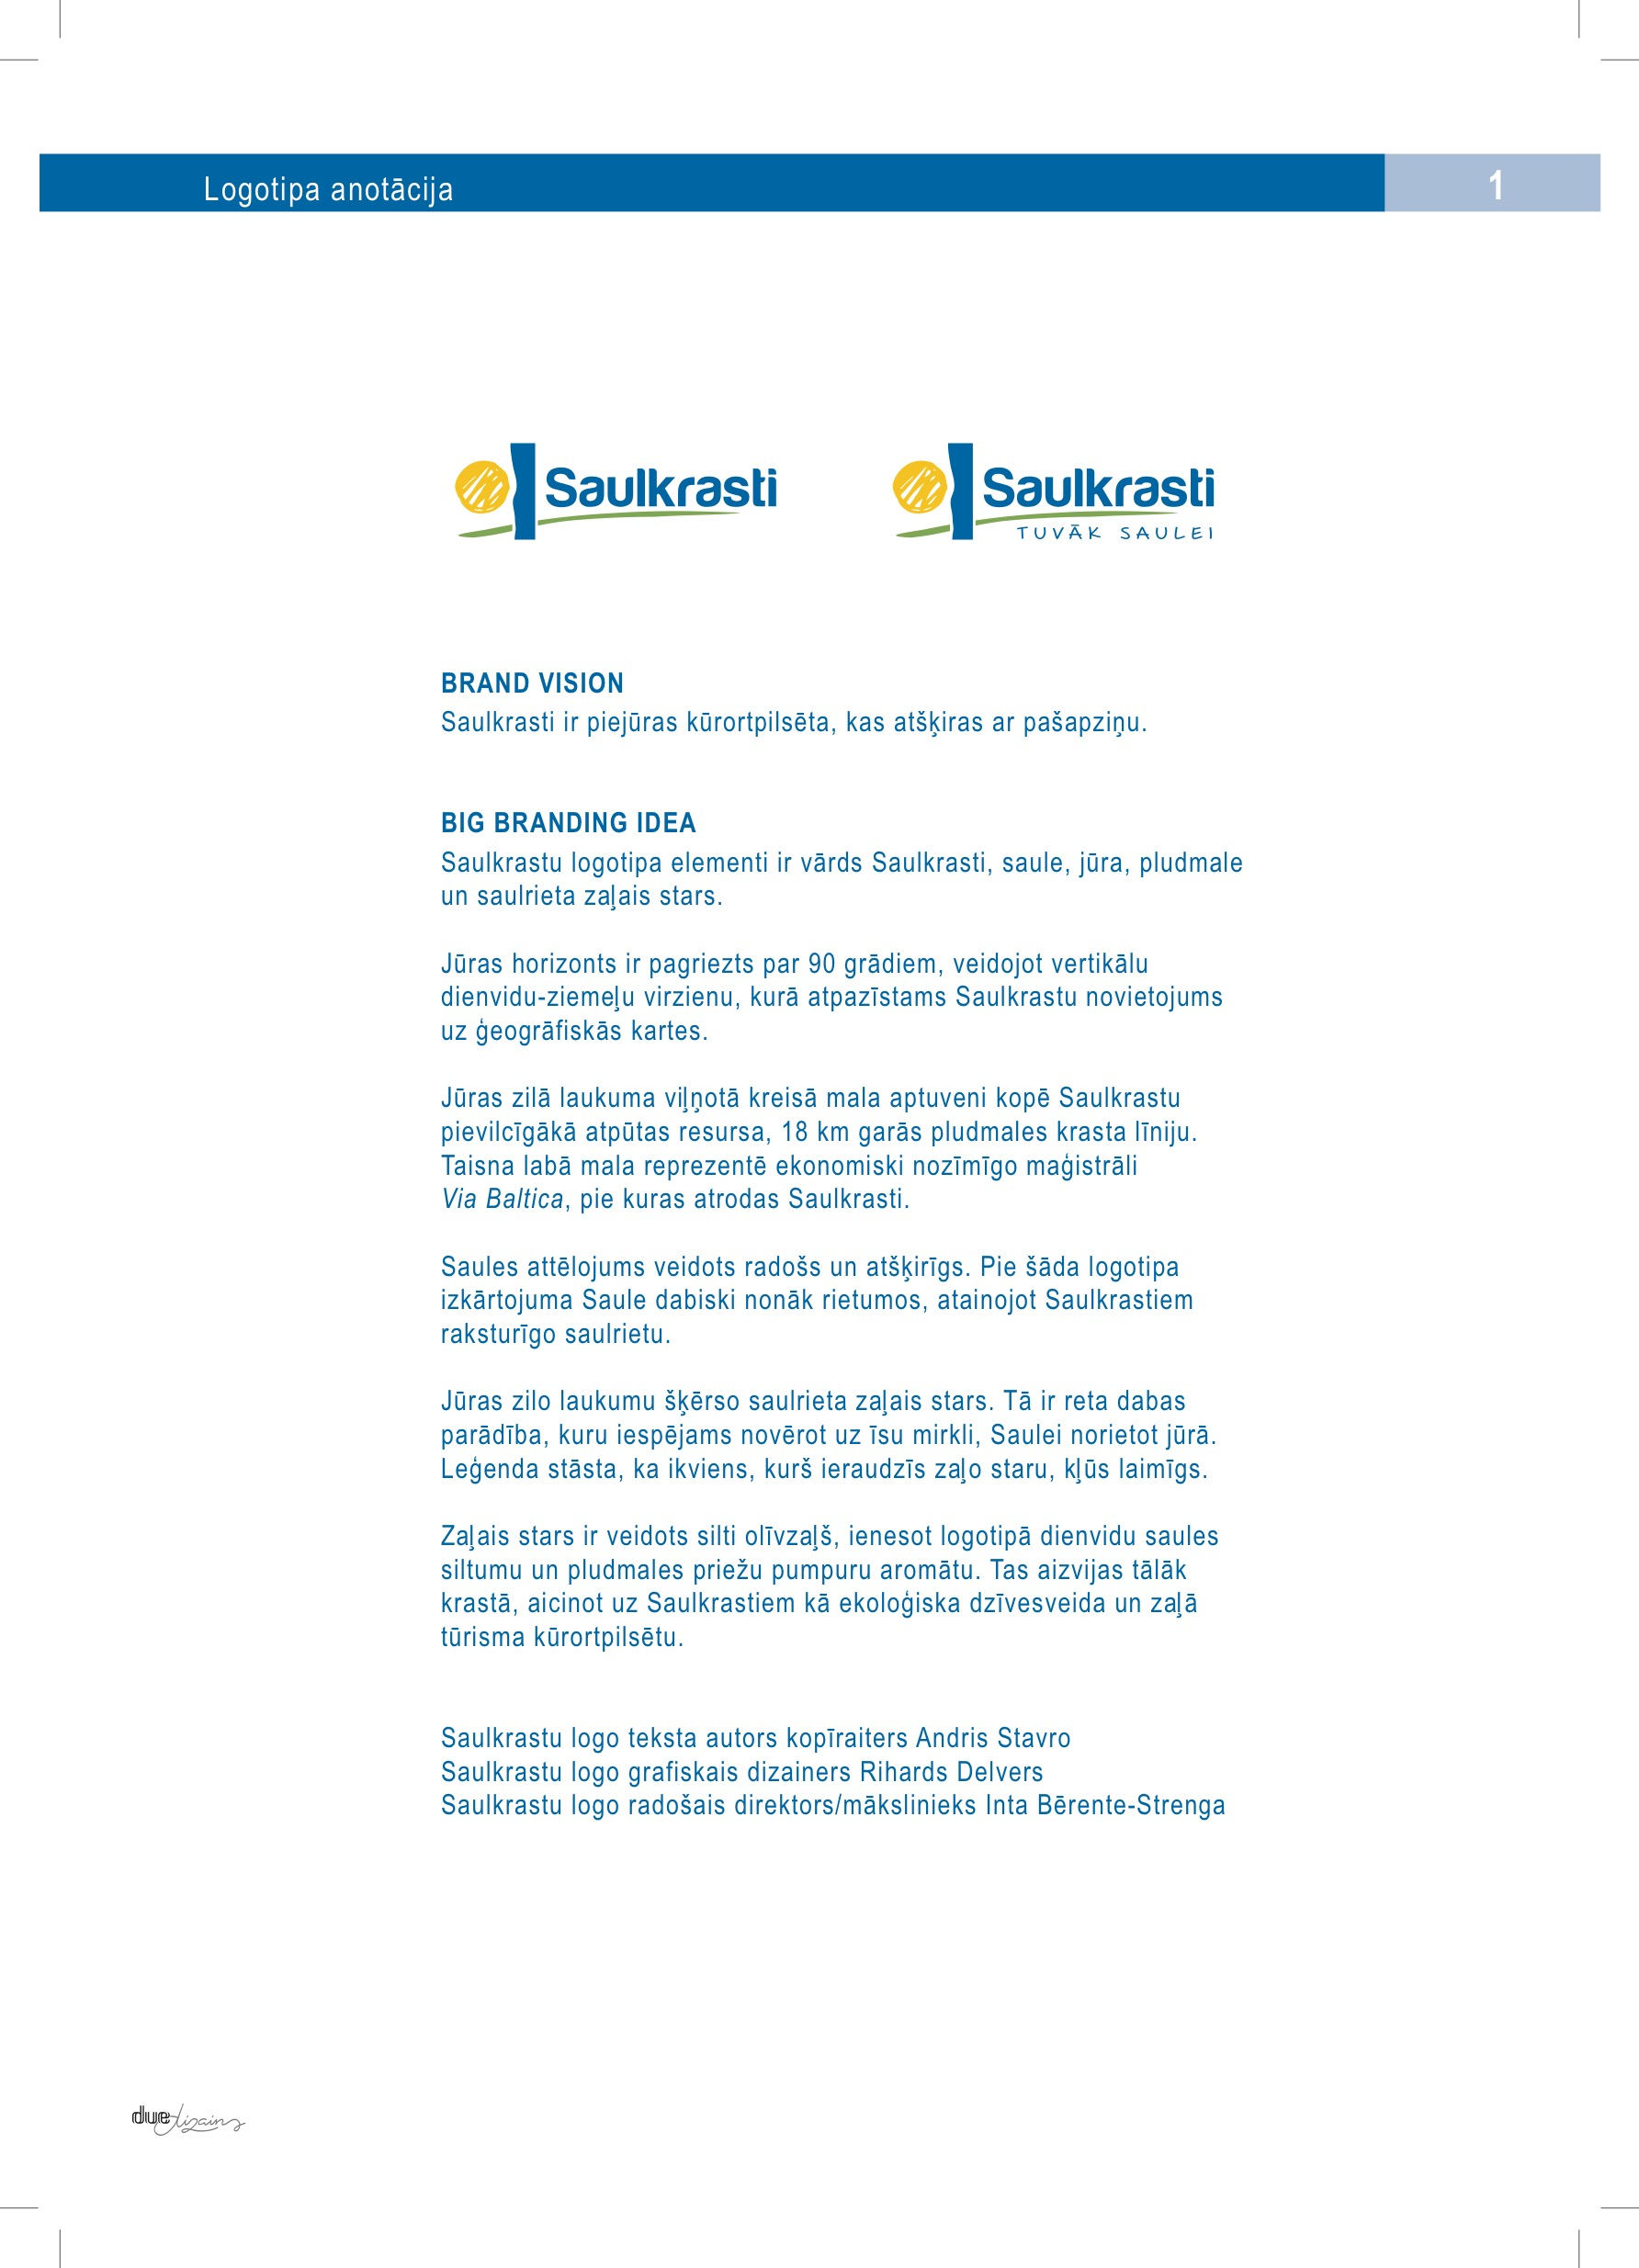 saulkrasti-print 3